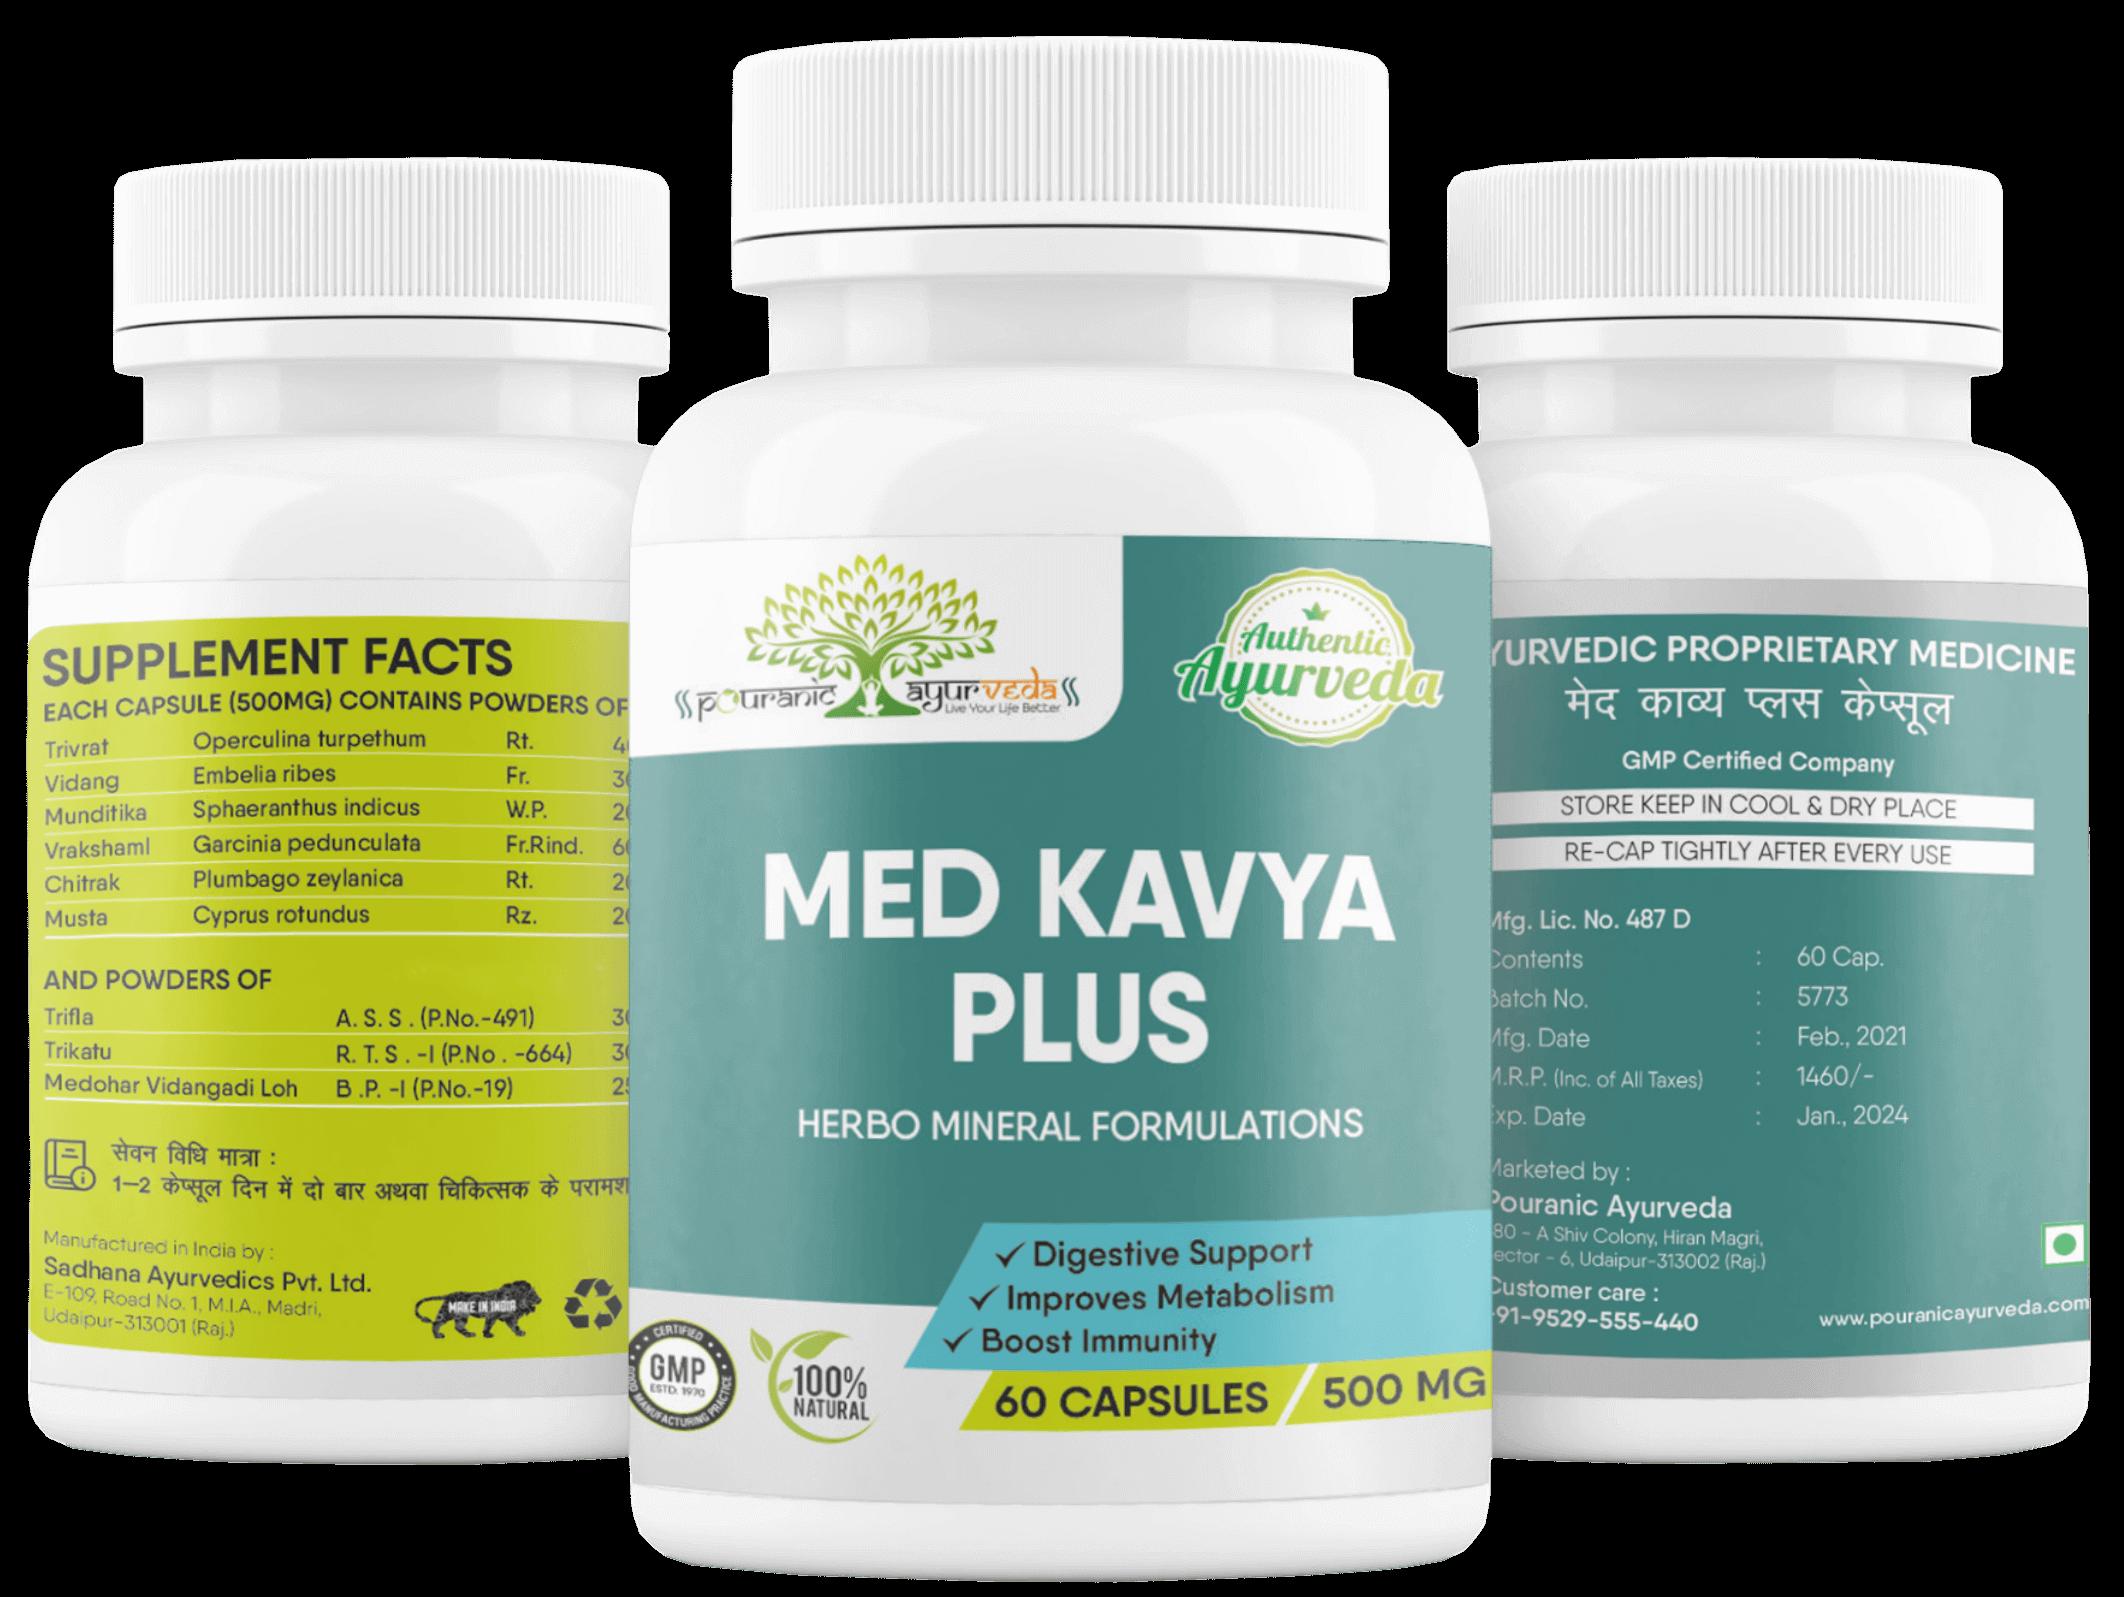 Med kavya  Plus Pouranic Ayurveda Slim Weight lose 9529555440 weight lose fat burn